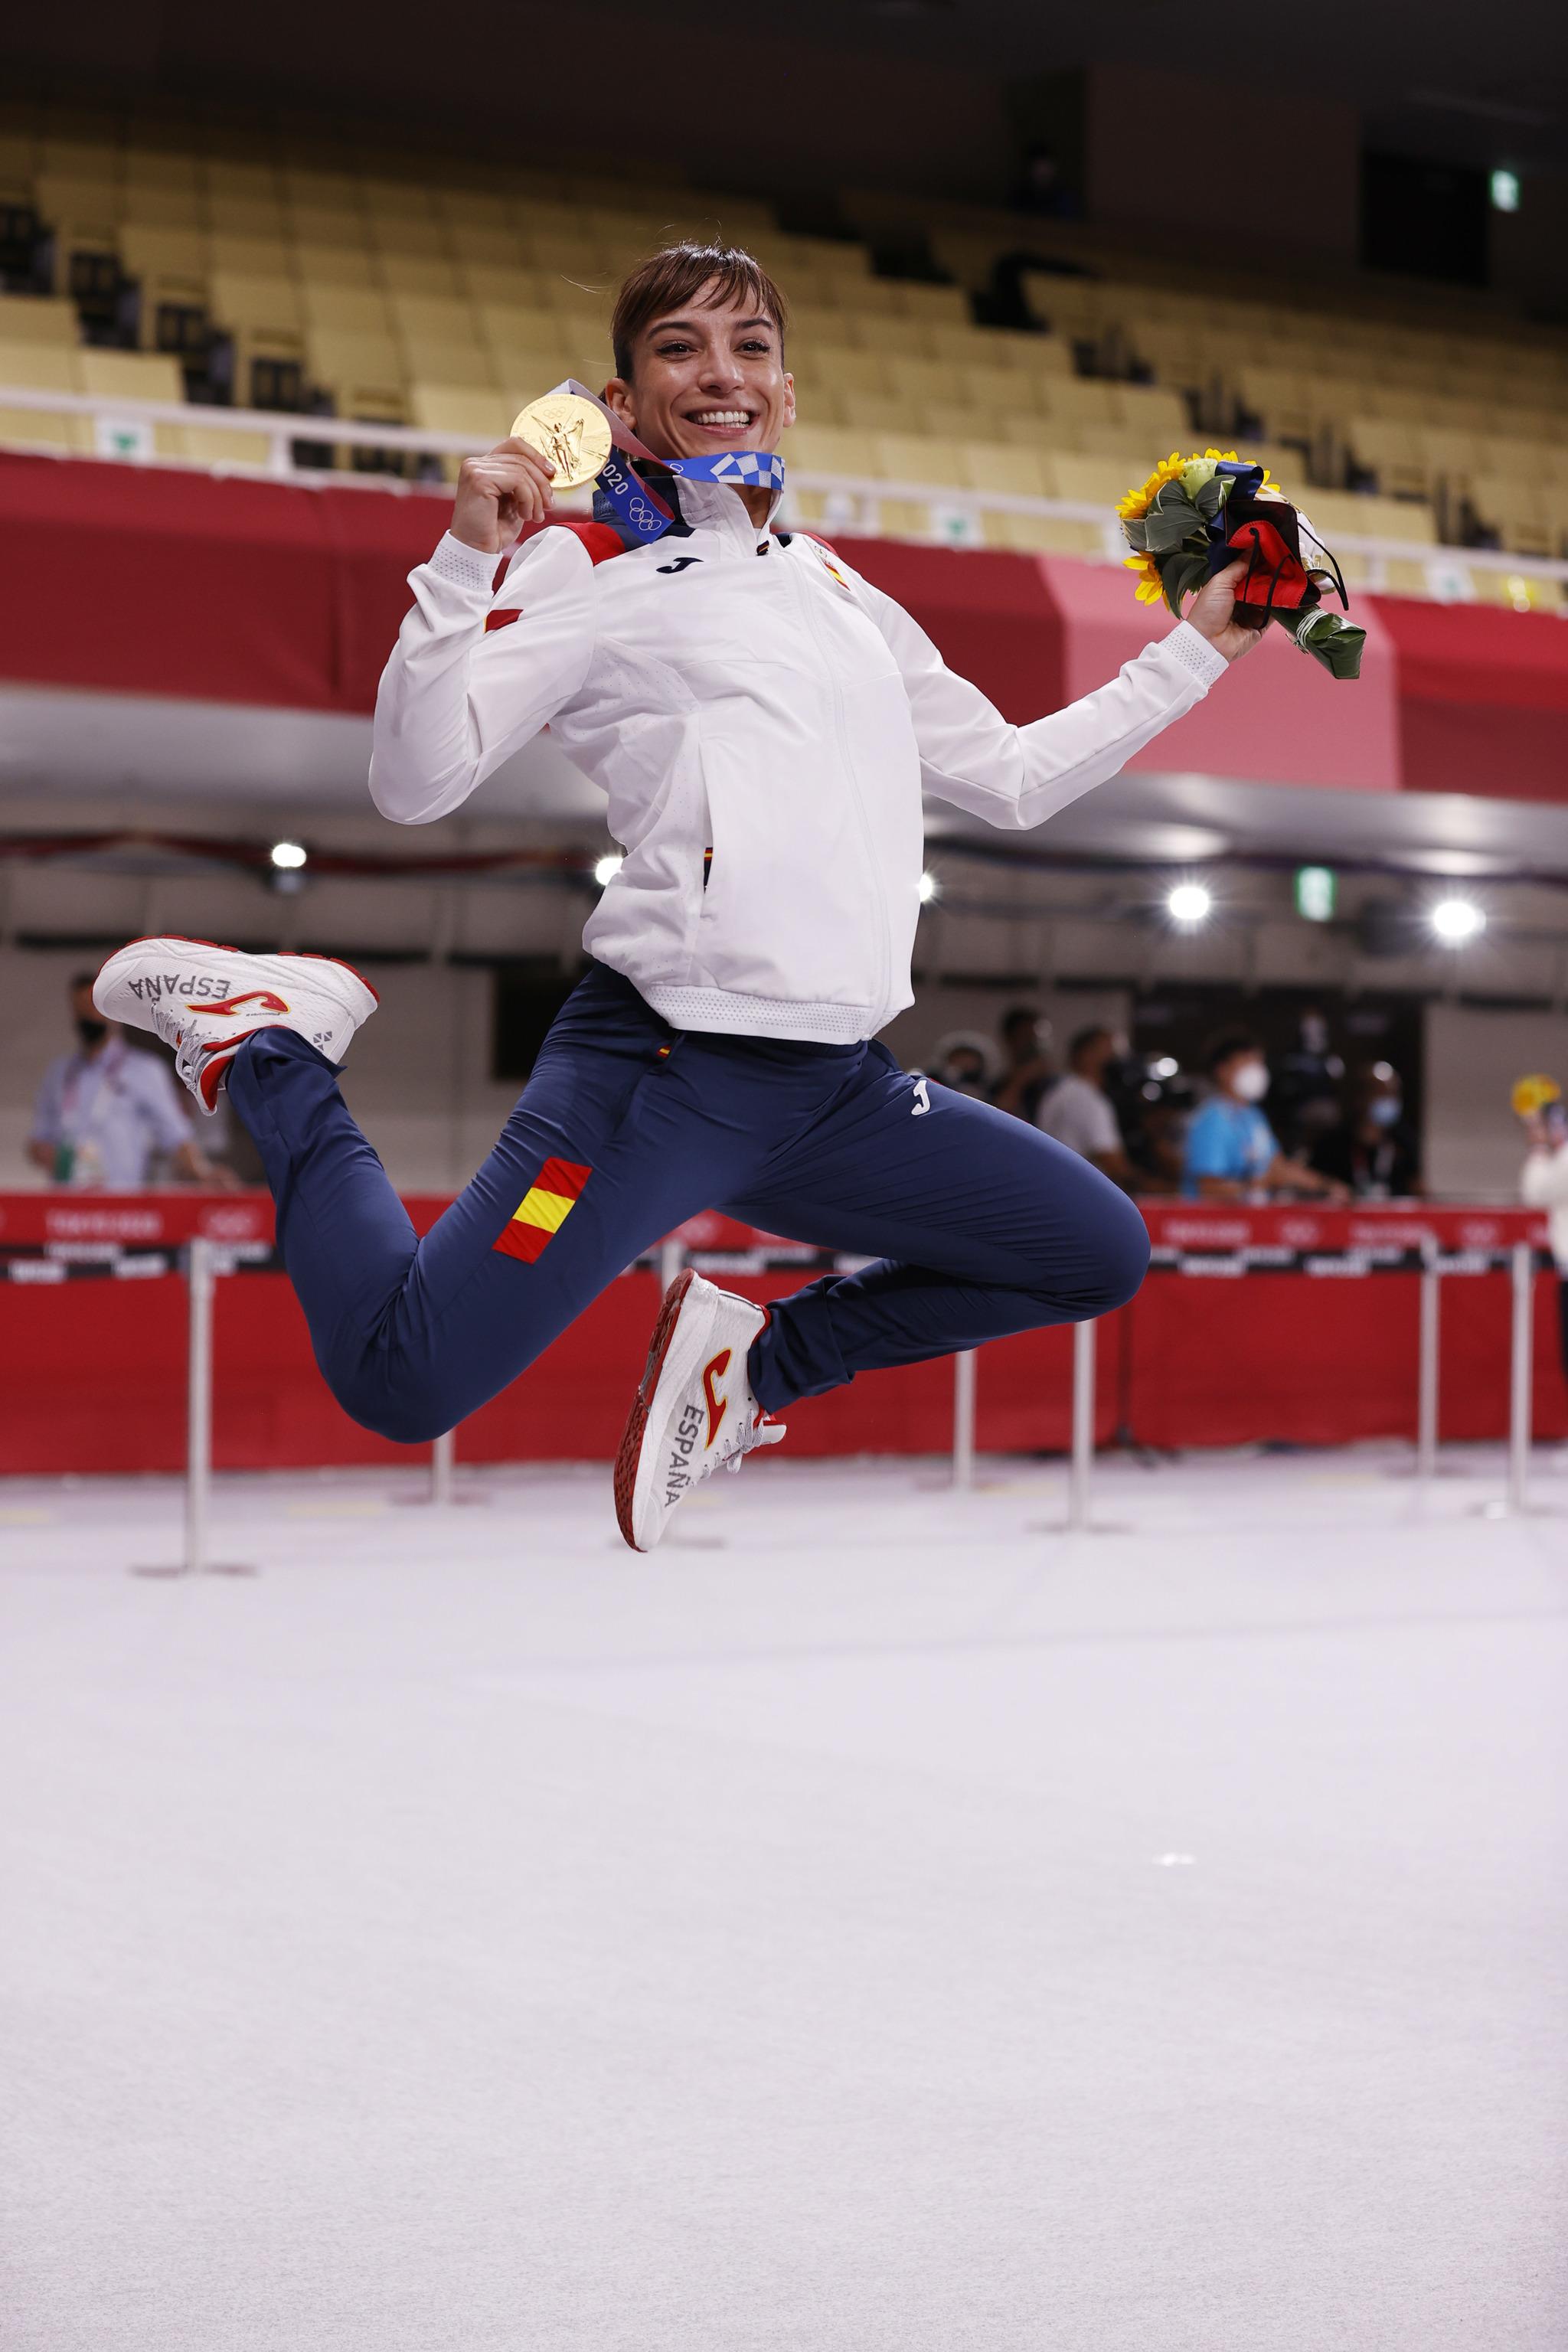 Sandra celebra el oro con un gran salto.